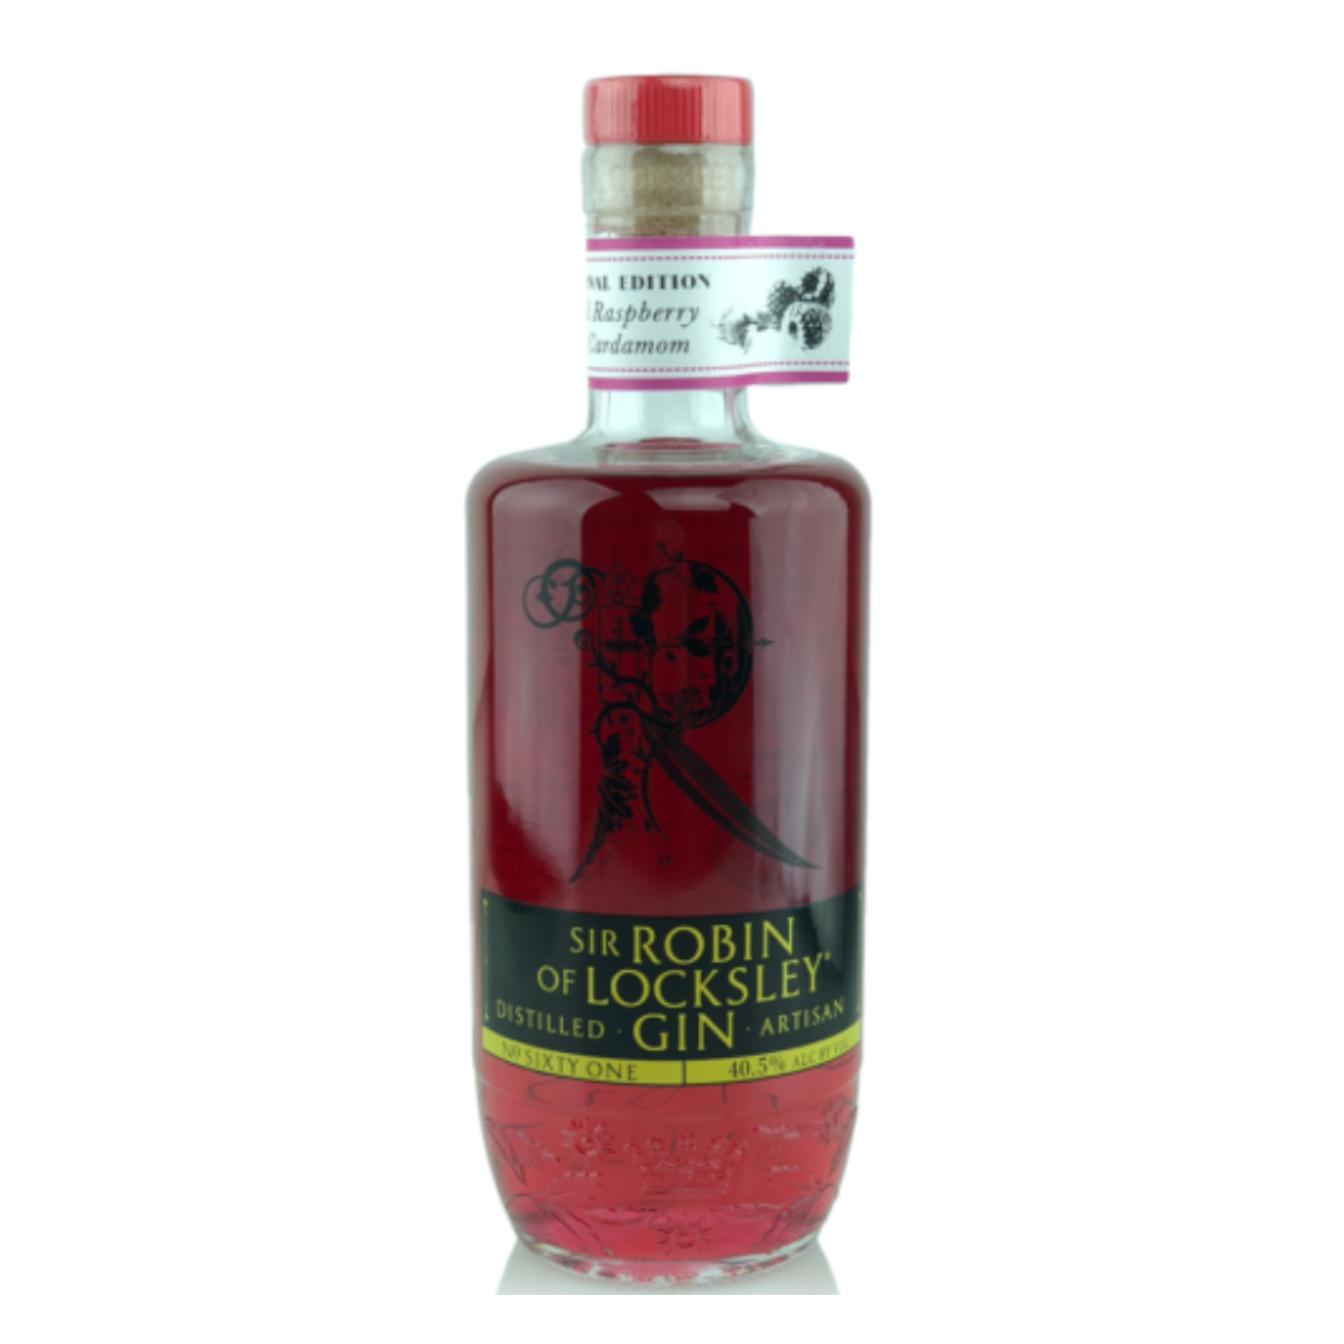 Sir Robin of Locksley Raspberry & Cardamom Gin